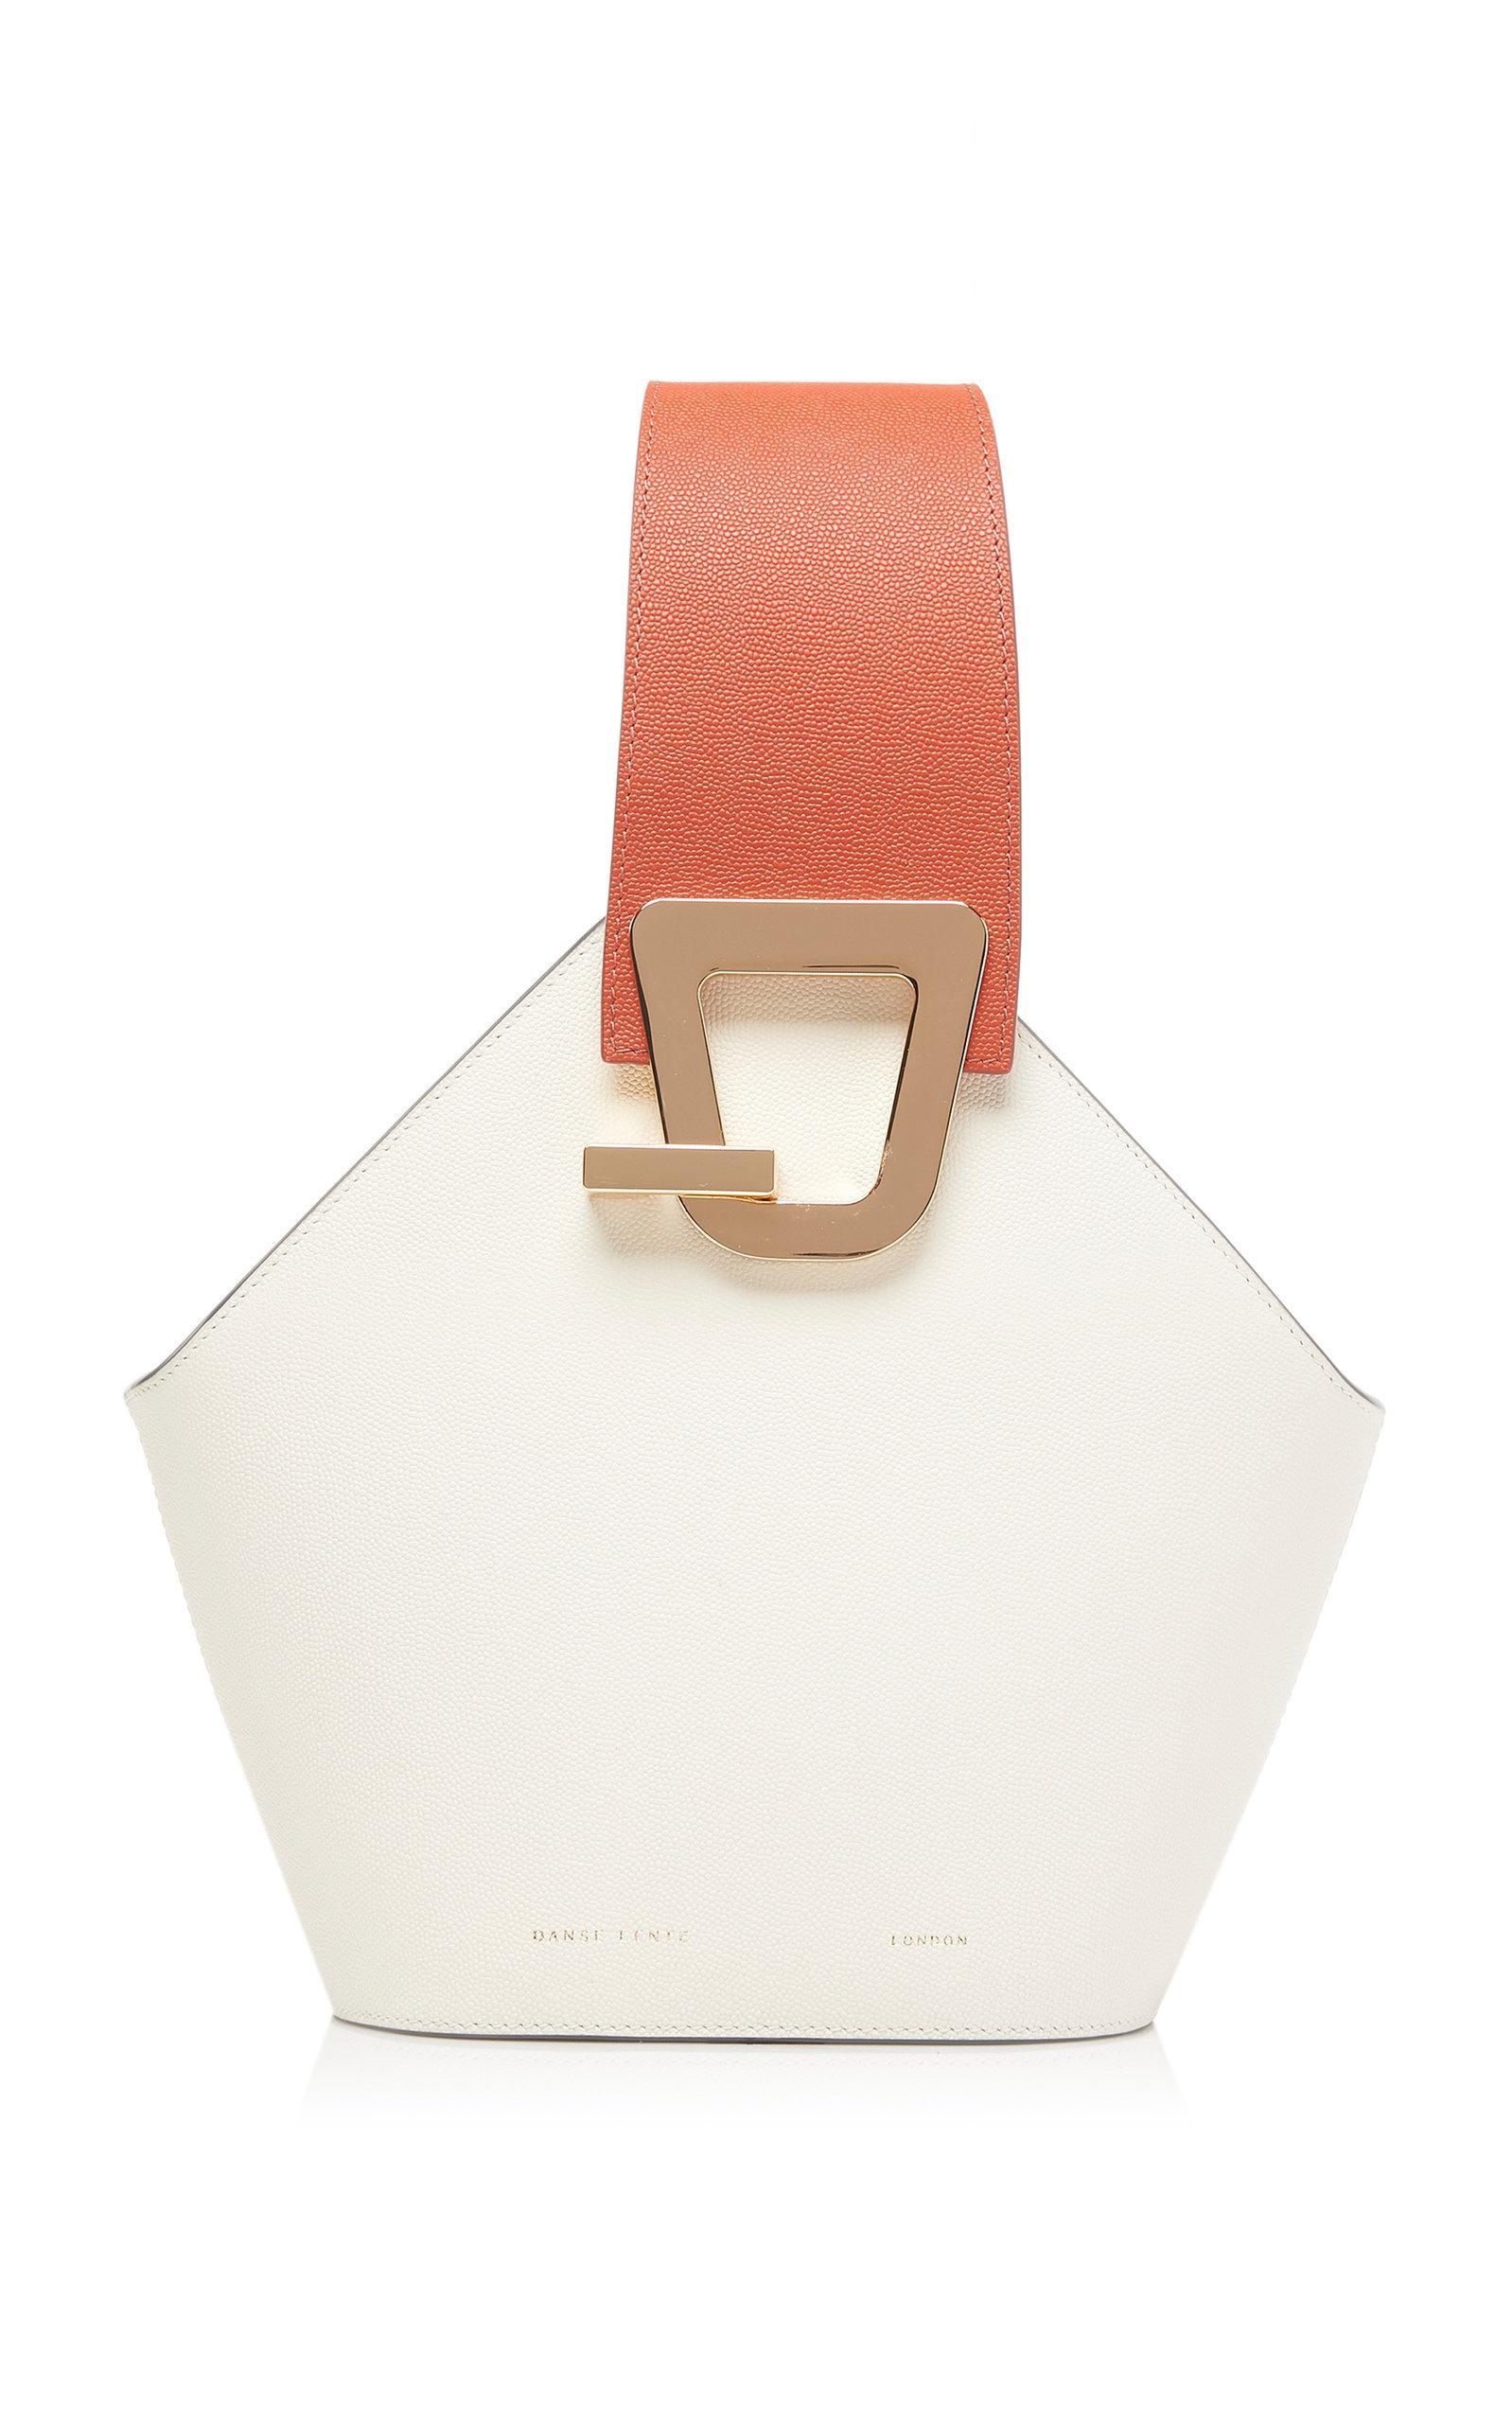 9c35107d7832 Danse Lente Johnny Mini Leather Bucket Bag in White - Lyst